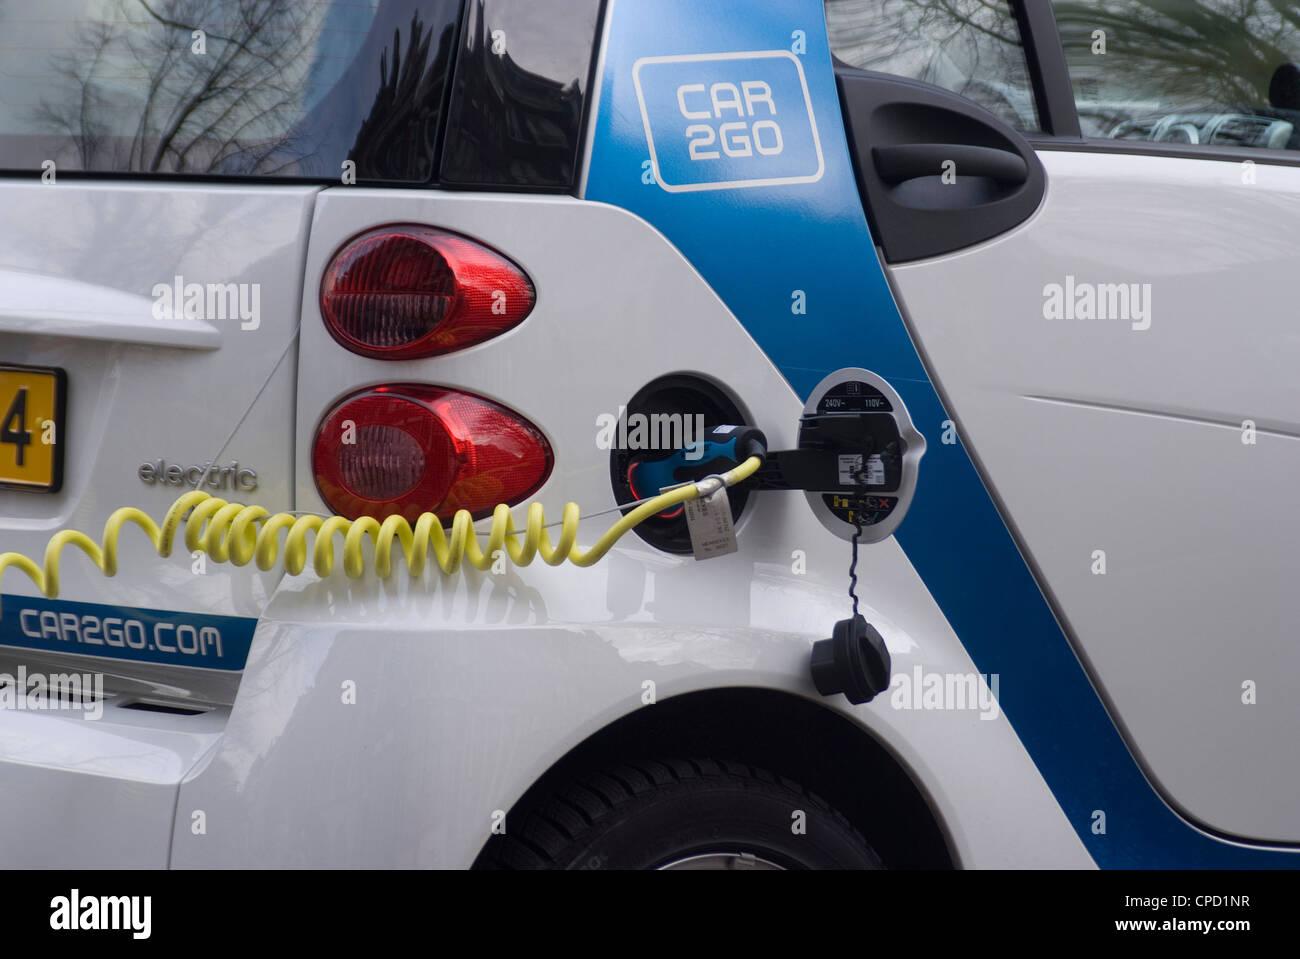 Electric Cars Charging Stockfotos & Electric Cars Charging Bilder ...